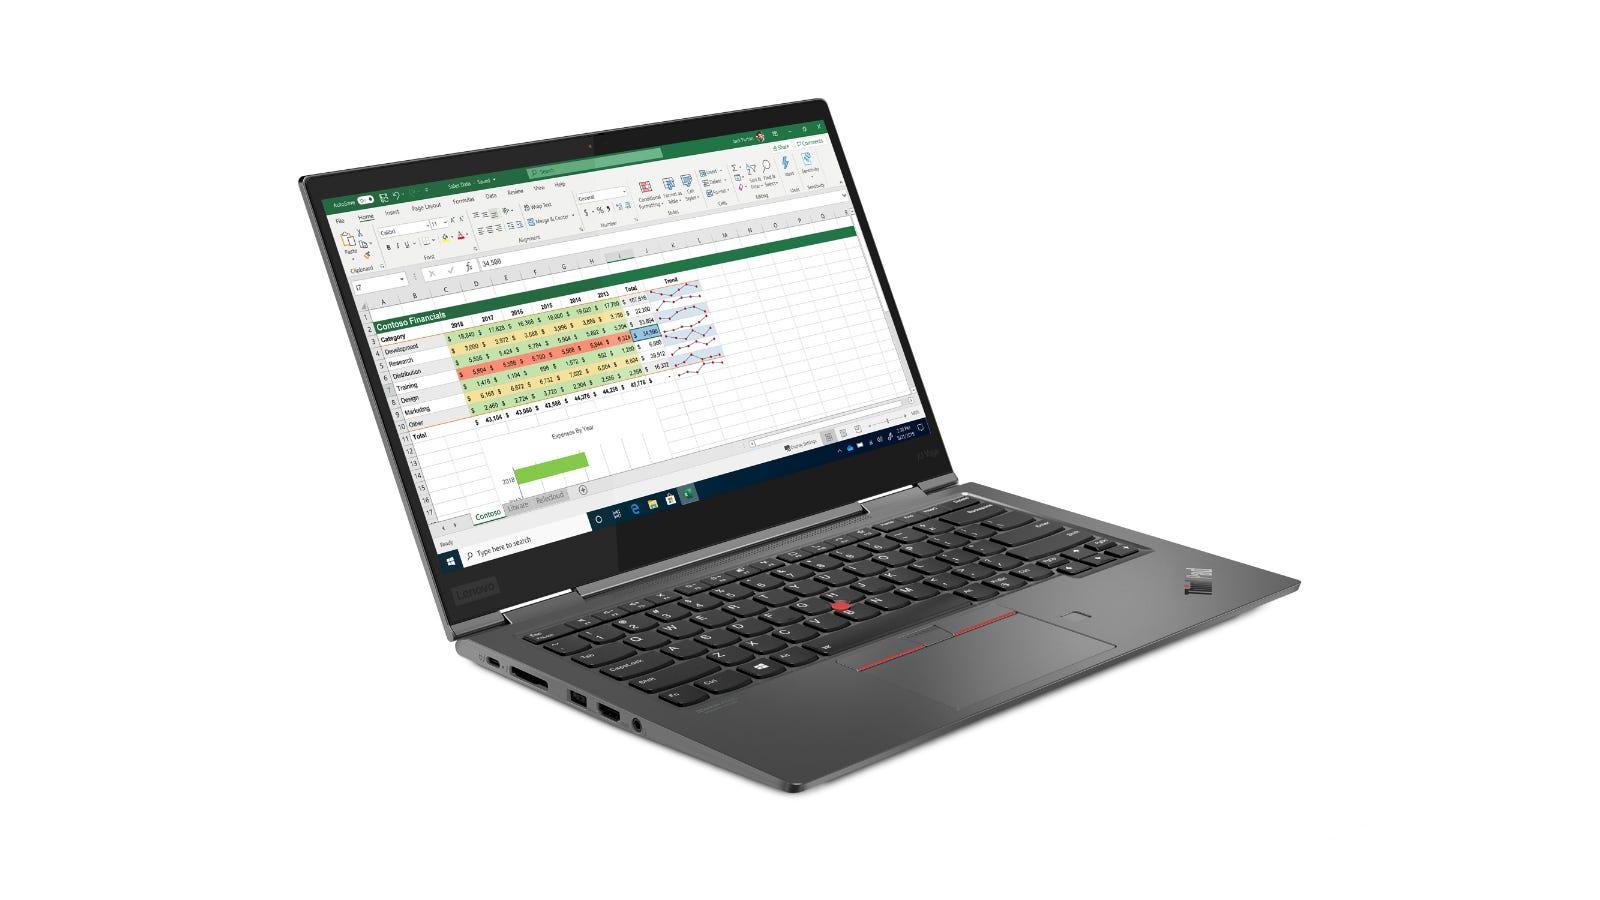 Lenovo ThinkPad X1 Yoga 5th generation from the side